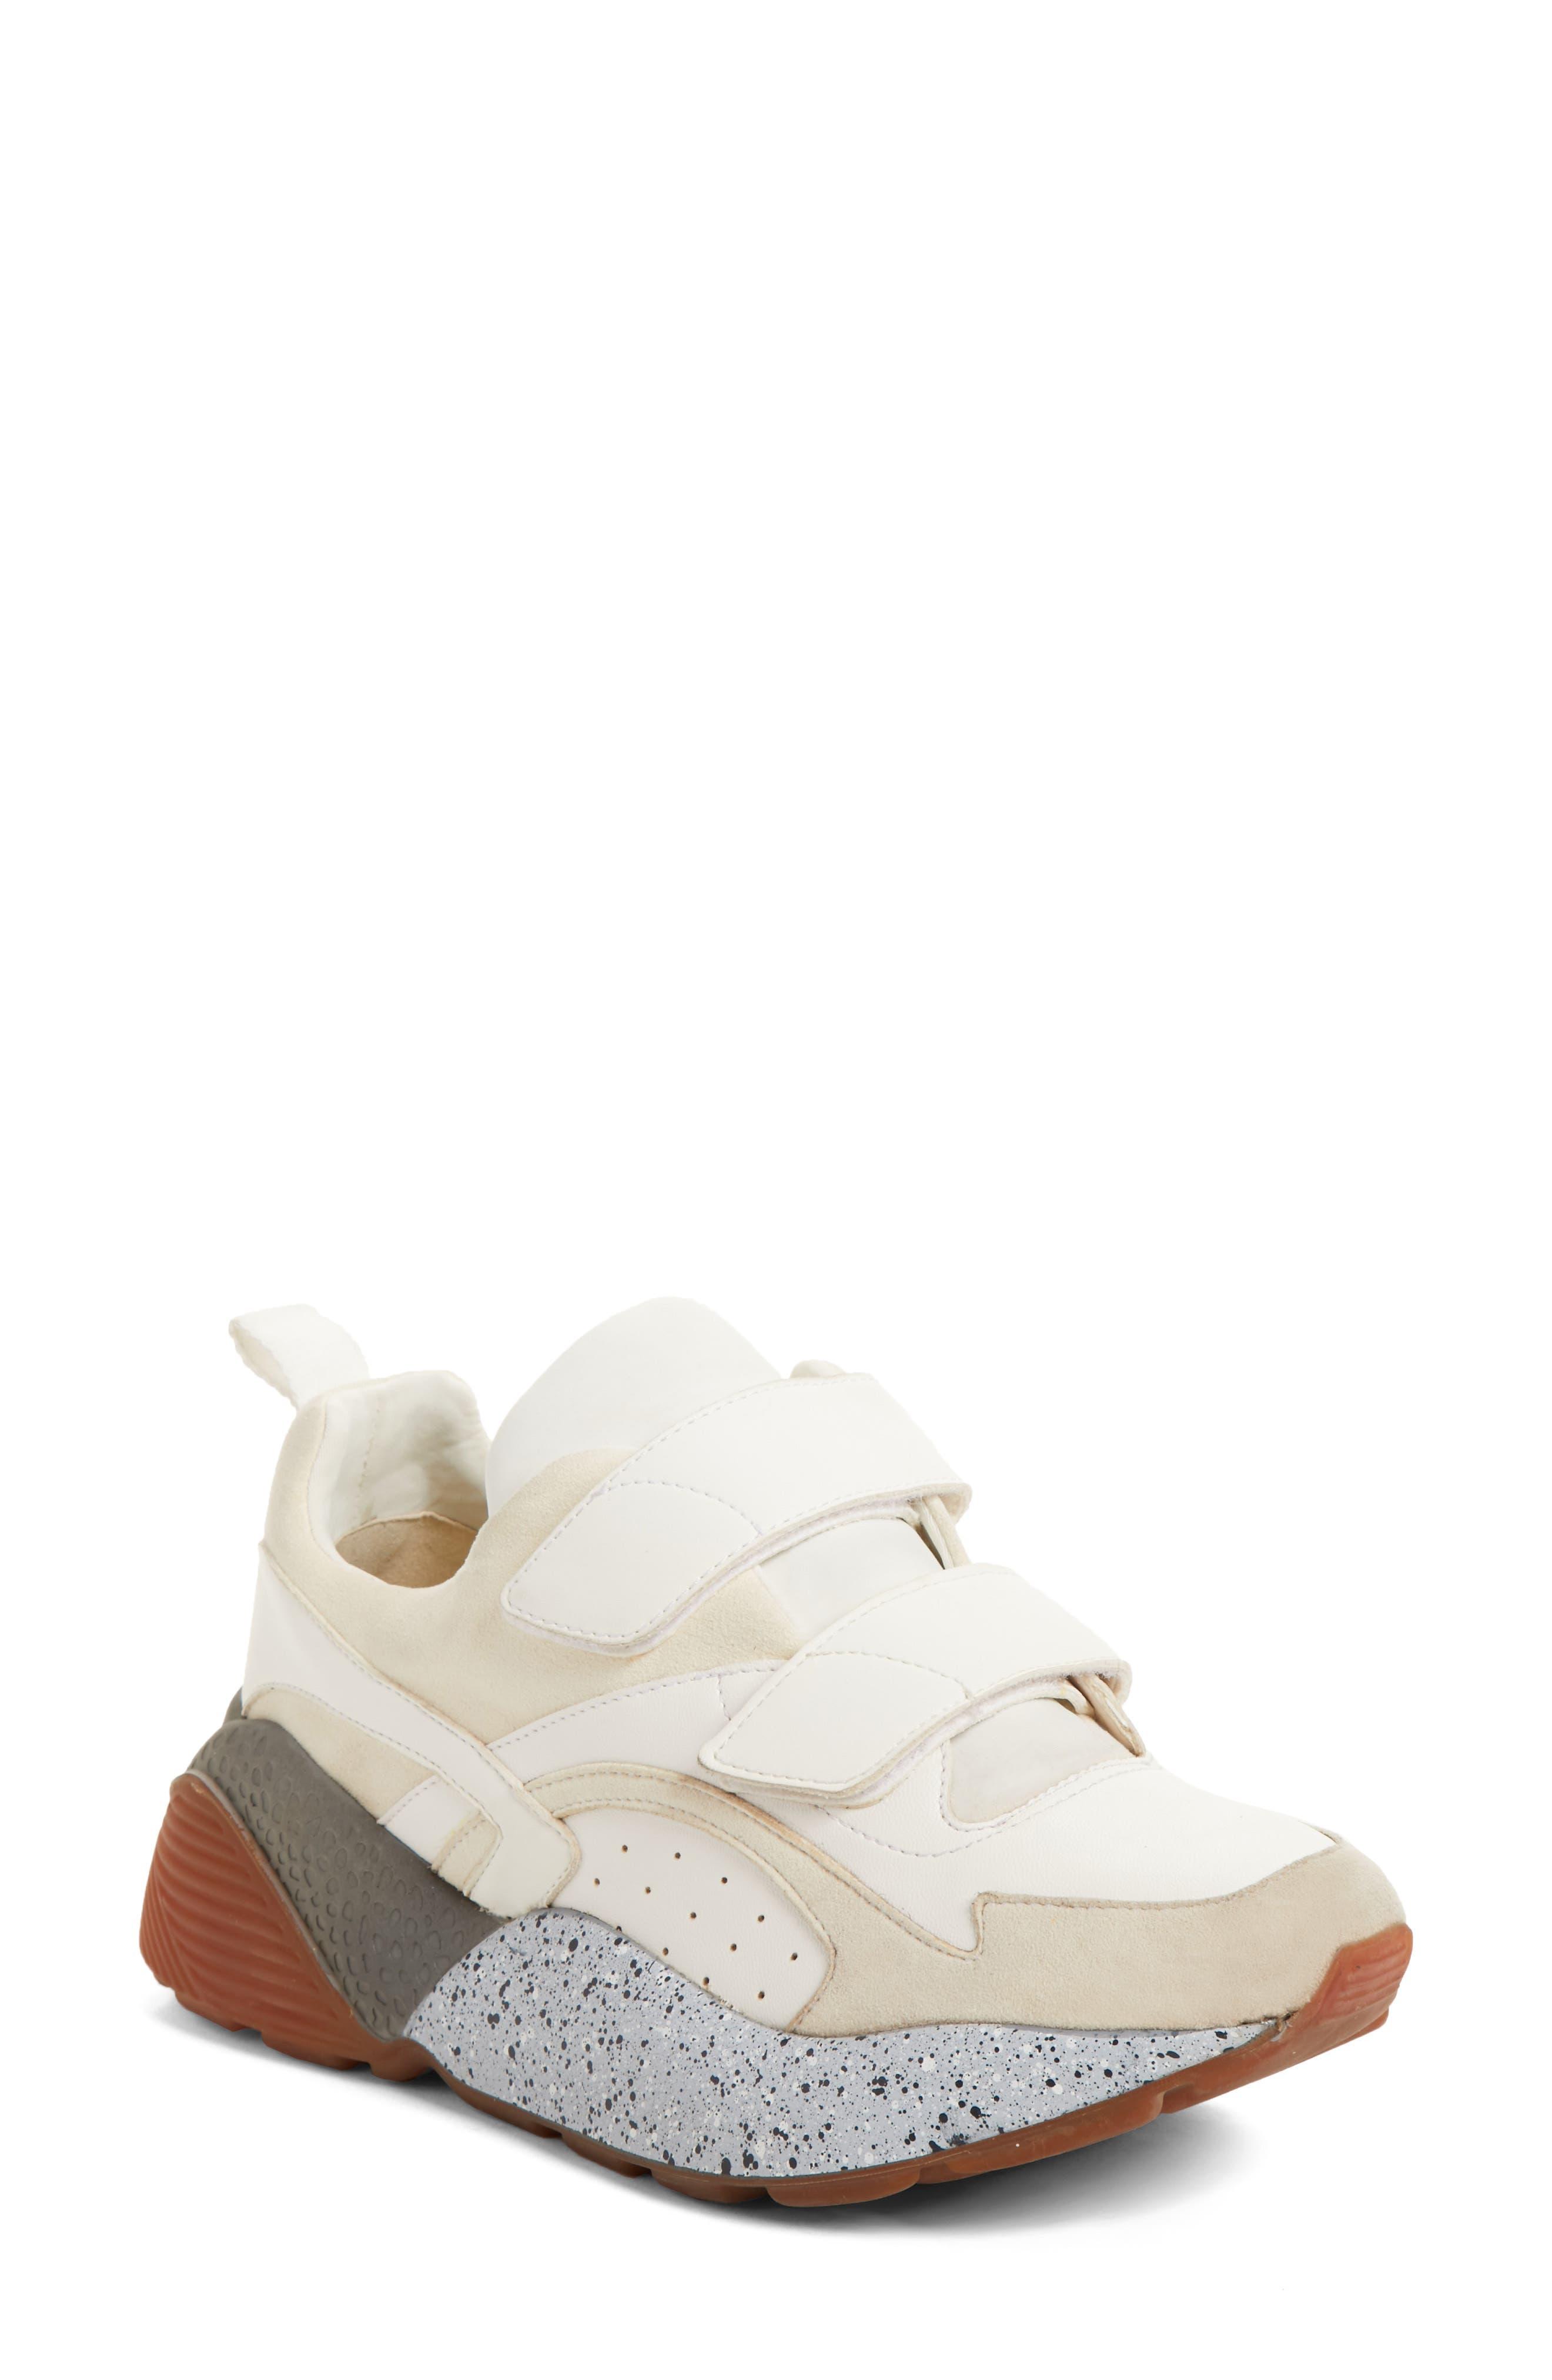 Main Image - Stella McCartney Platform Sneaker (Women)